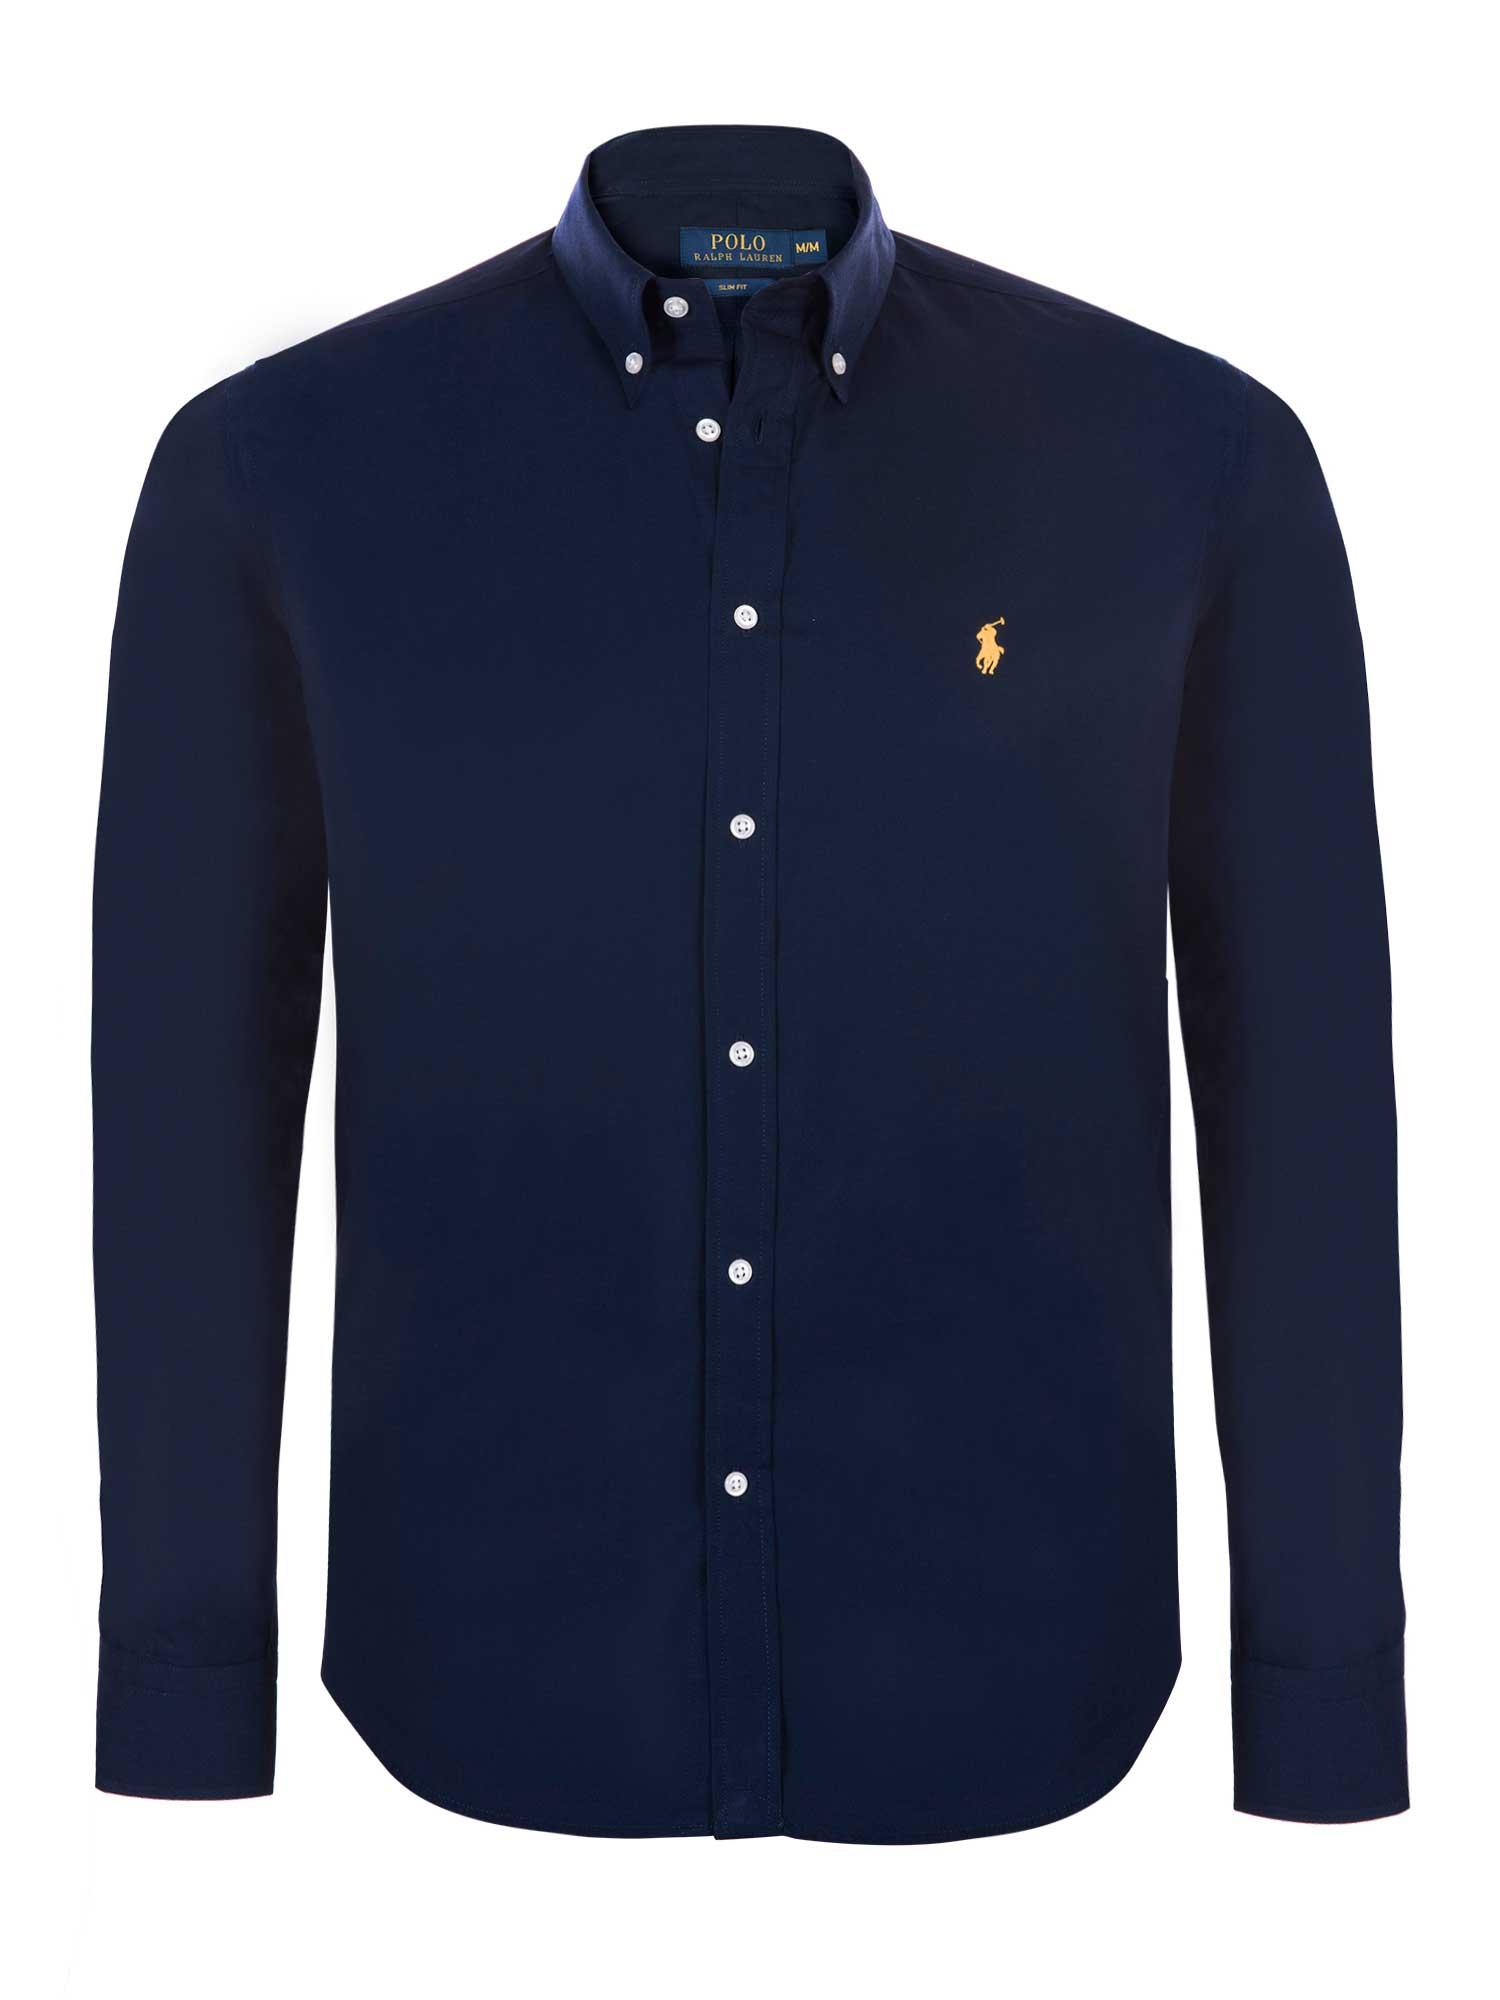 22186 - Polo Ralph Lauren Designer Shirts Europe